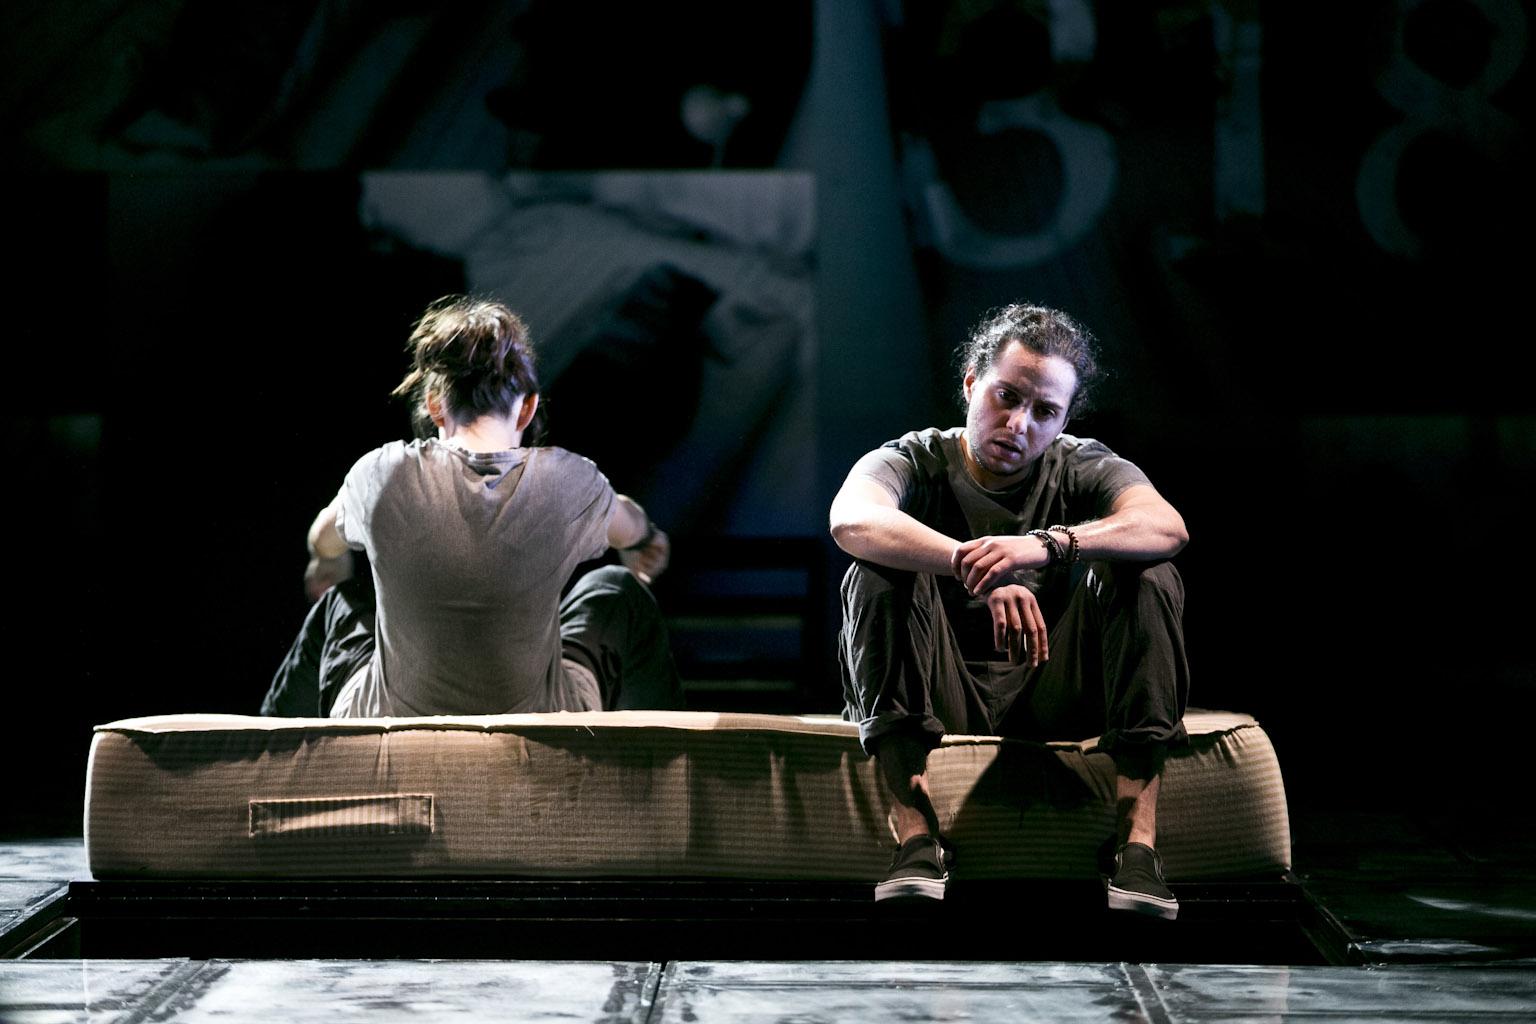 Adam - National Theatre of Scotland